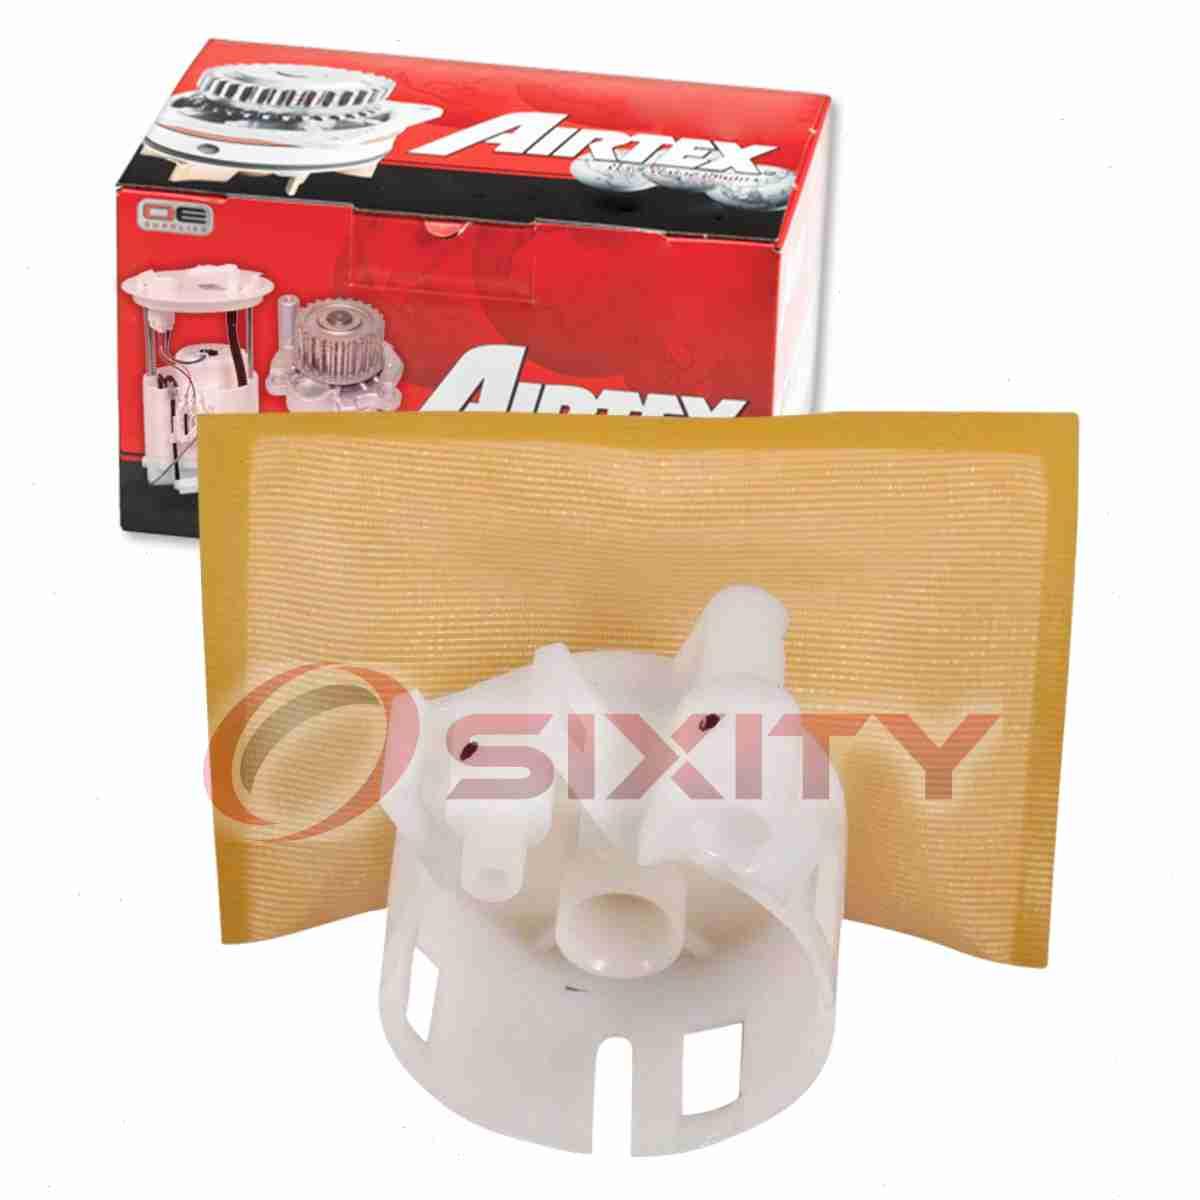 2004 Kia Amanti Parts Fuse Box Airtex Fuel Pump Strainer For Gas 1200x1200